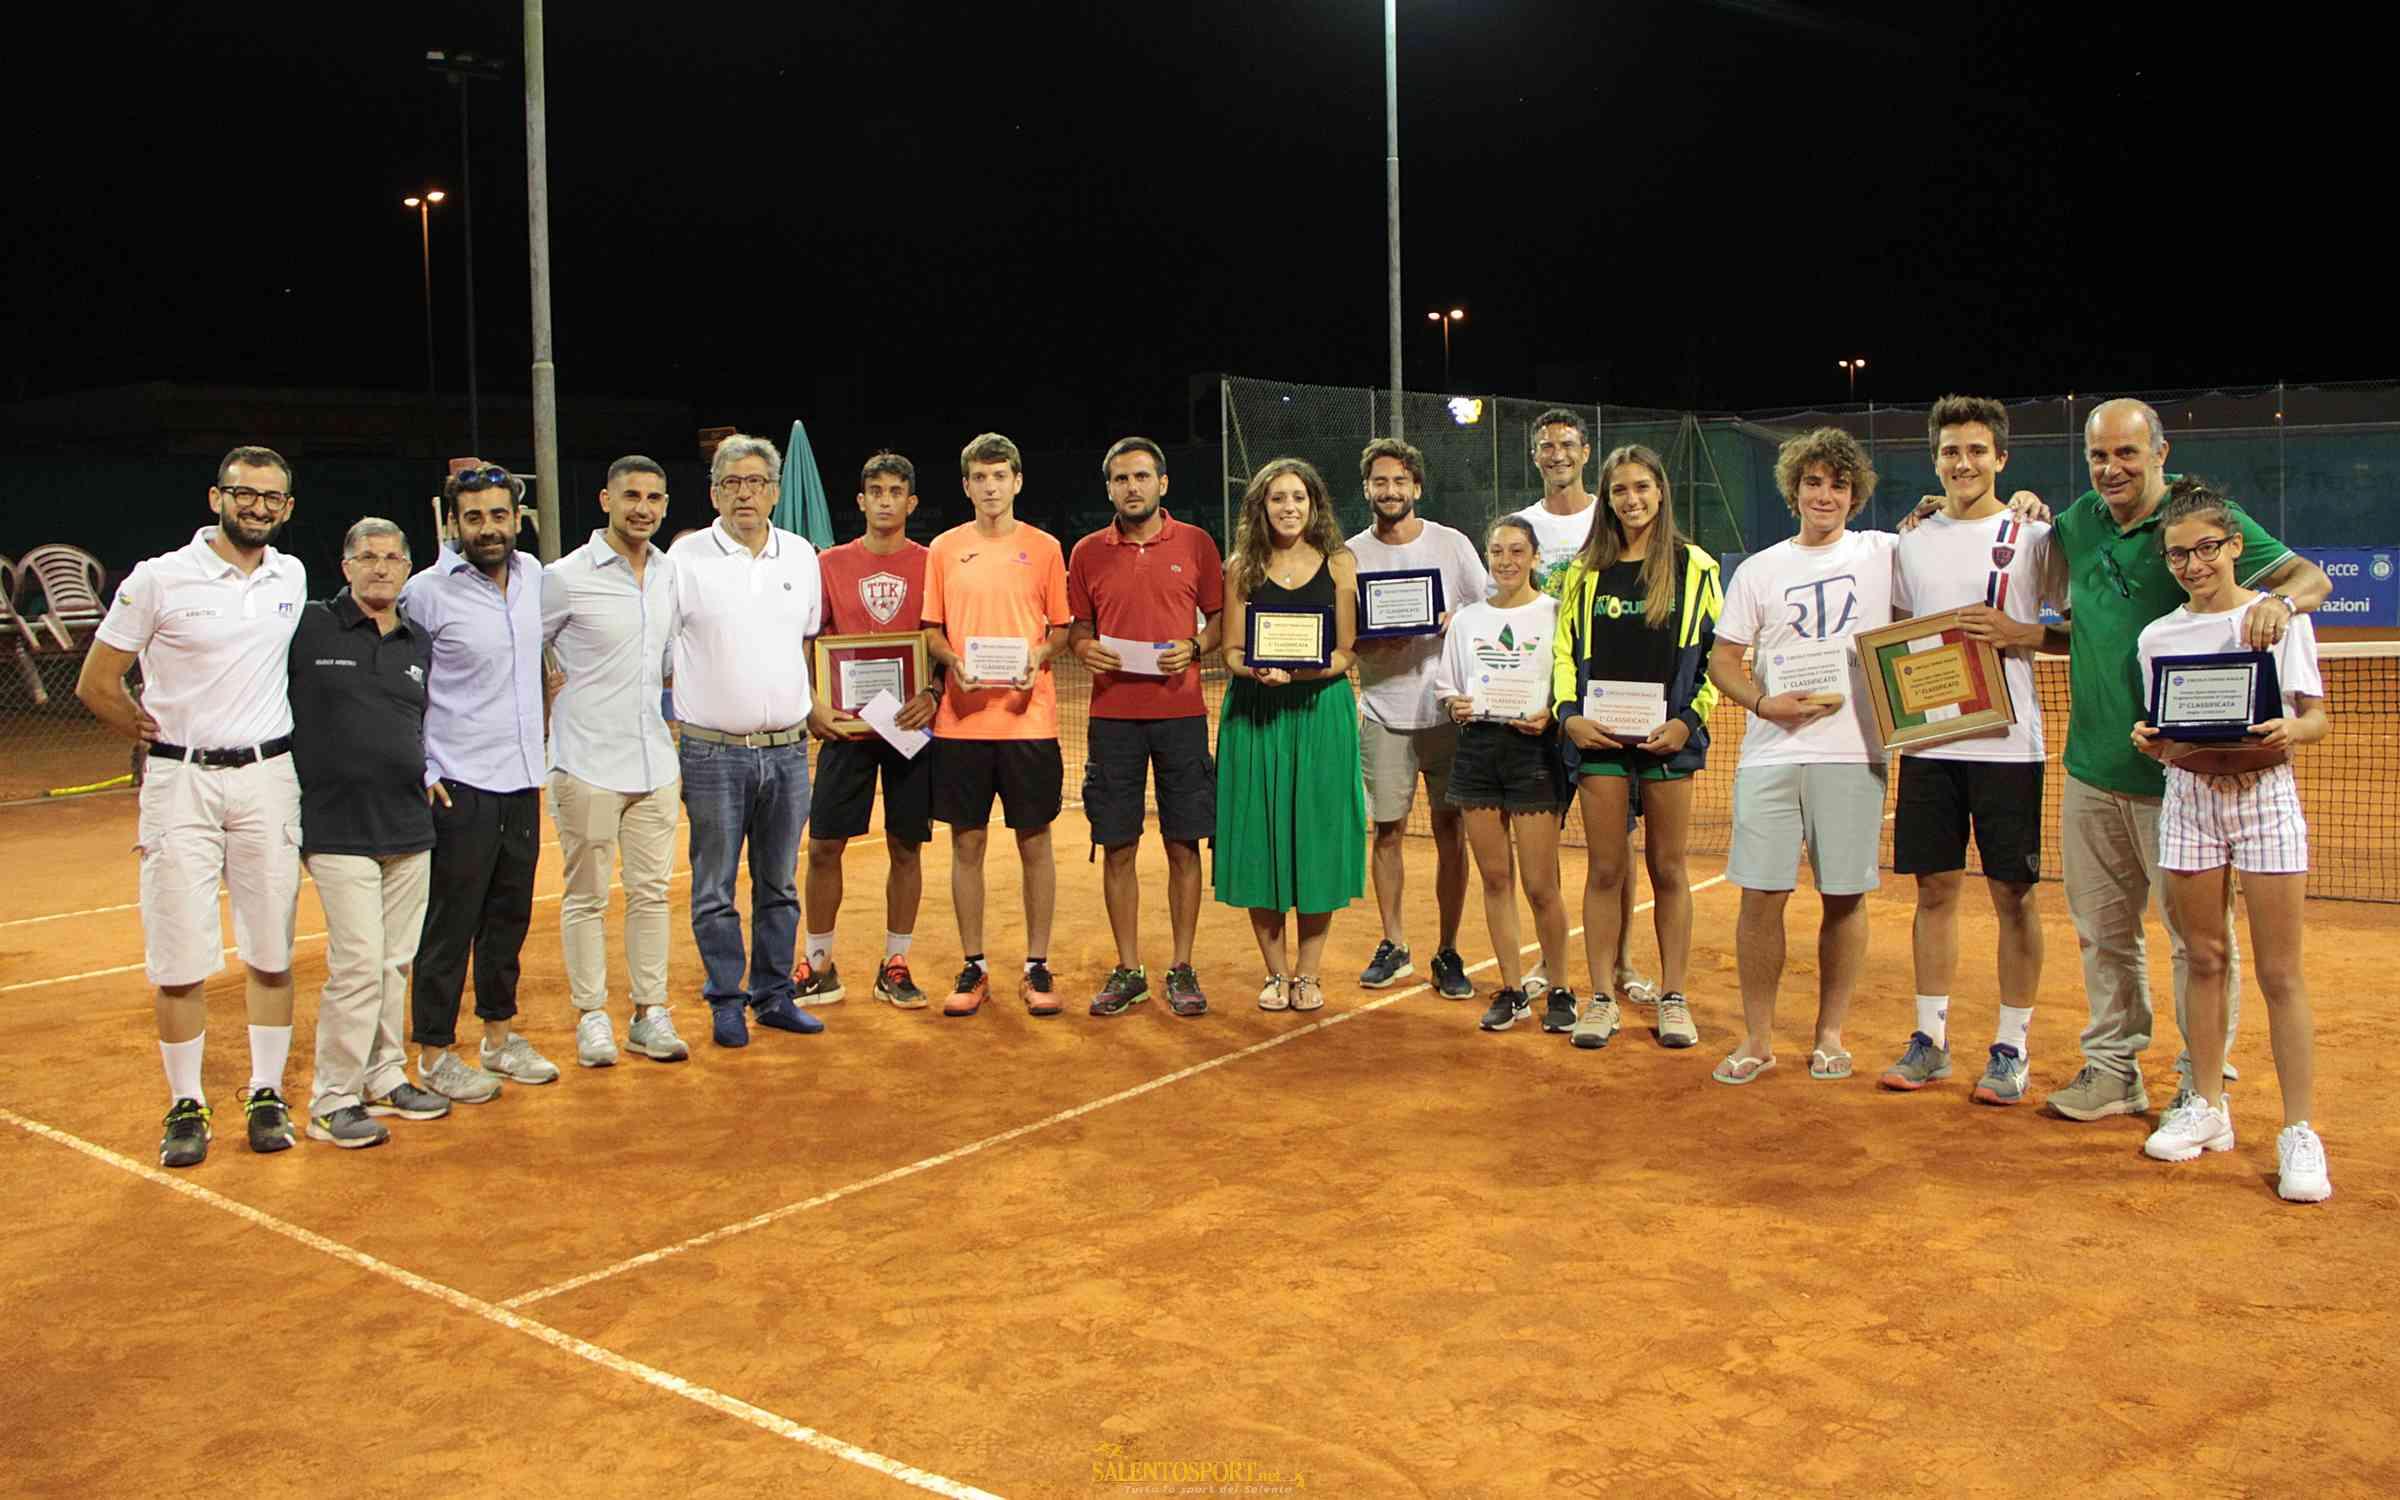 torneo-canicola-ct-maglie-tennis-ago-19